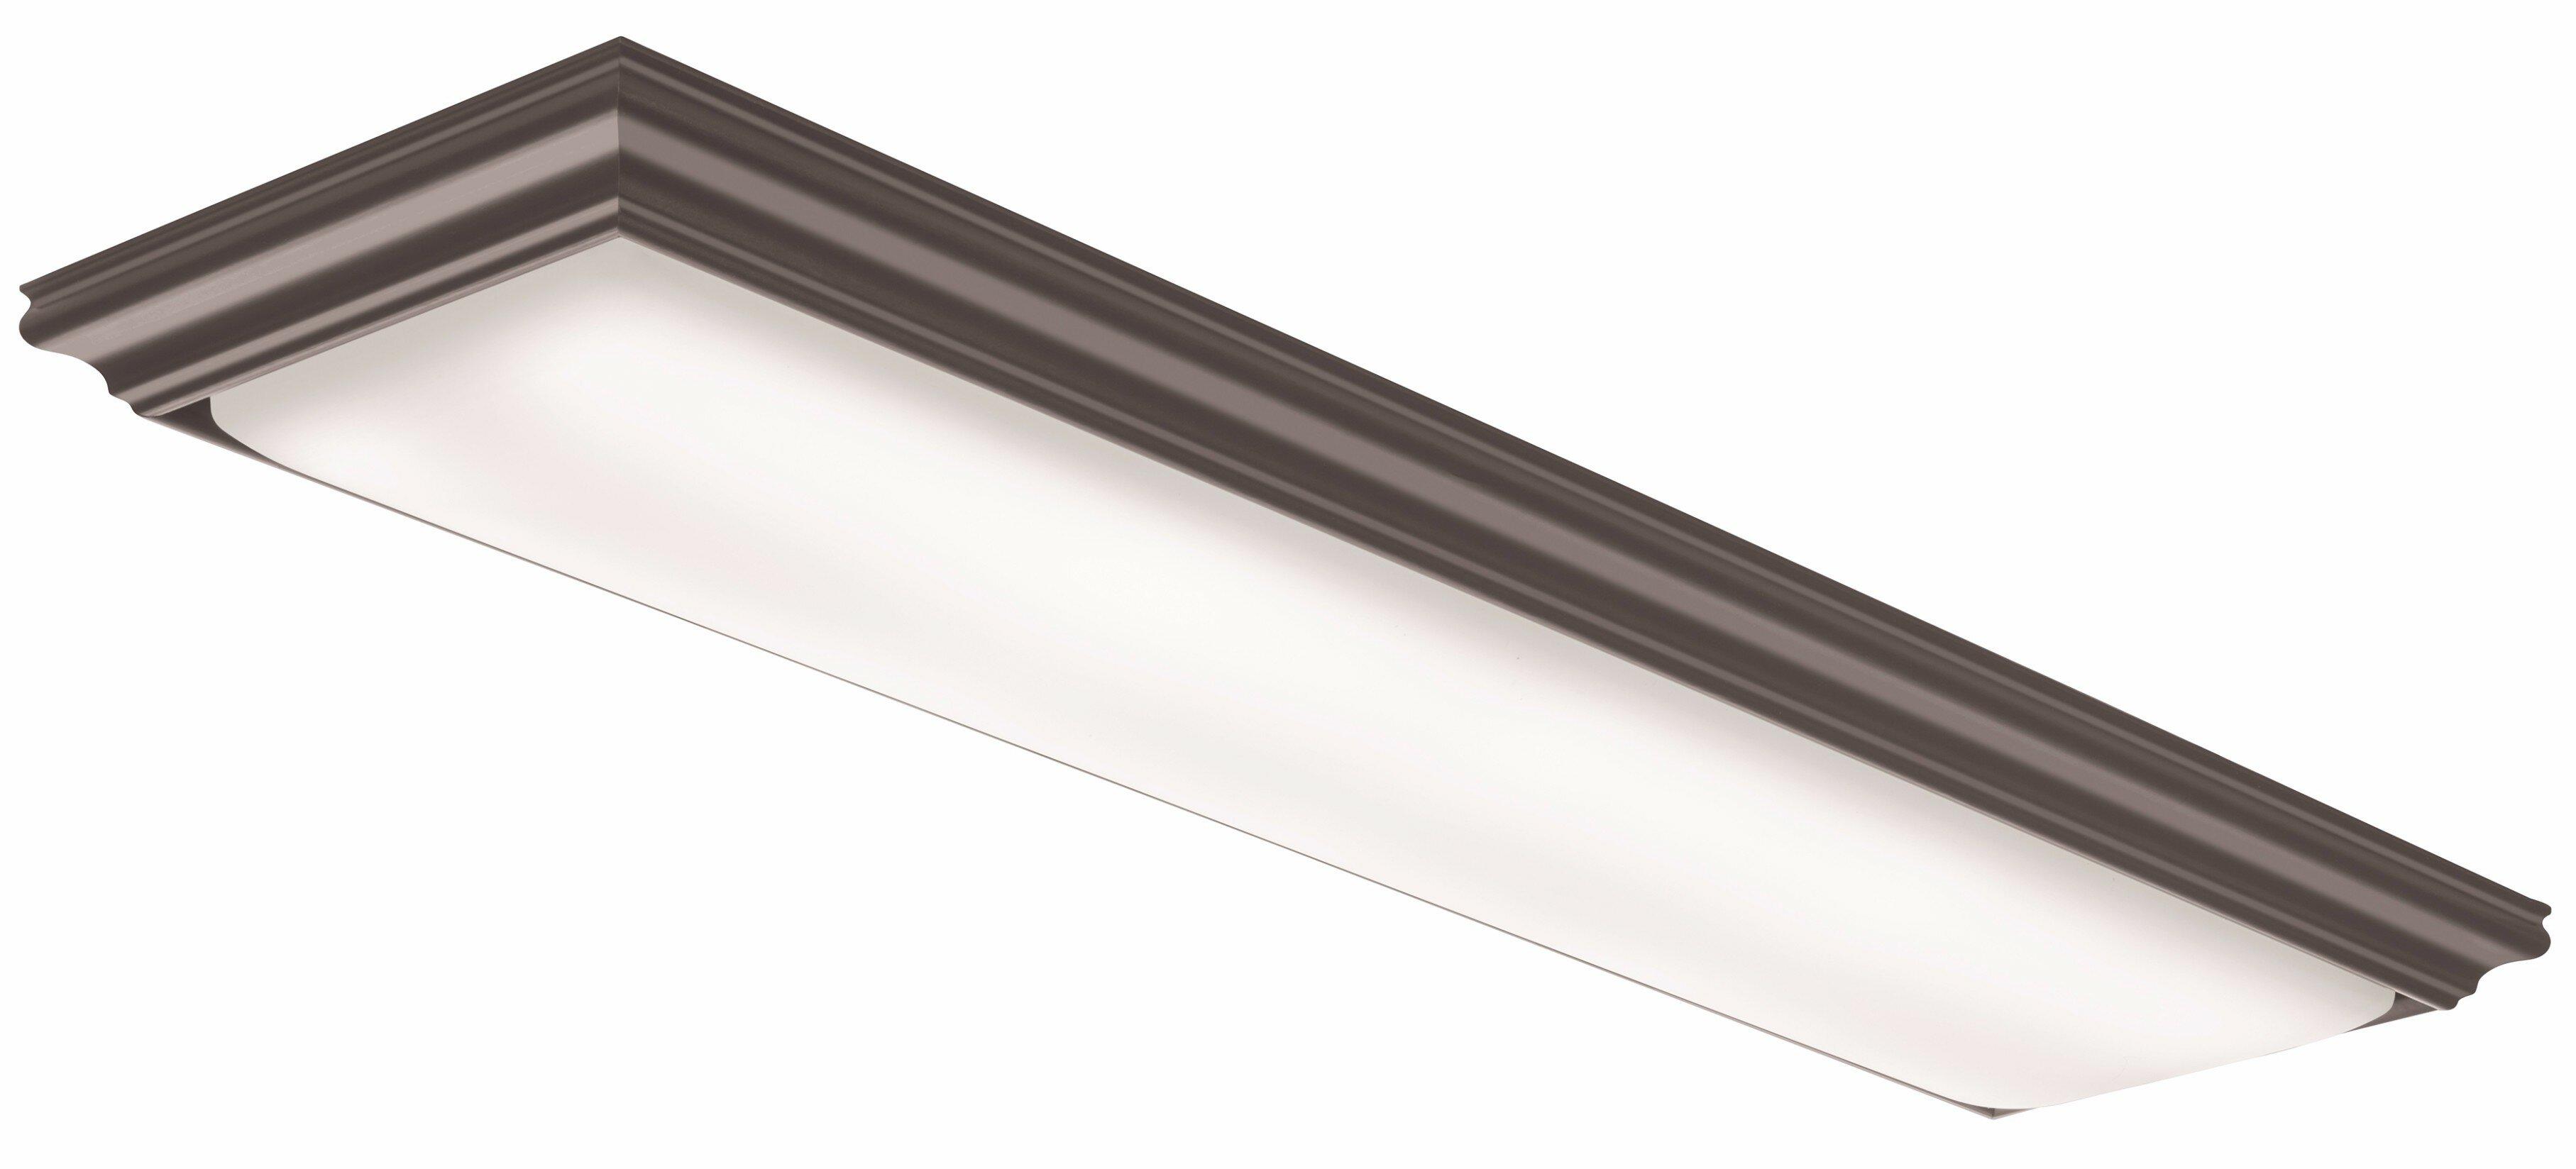 Lithonia Lighting 1 X 4 Led Flush